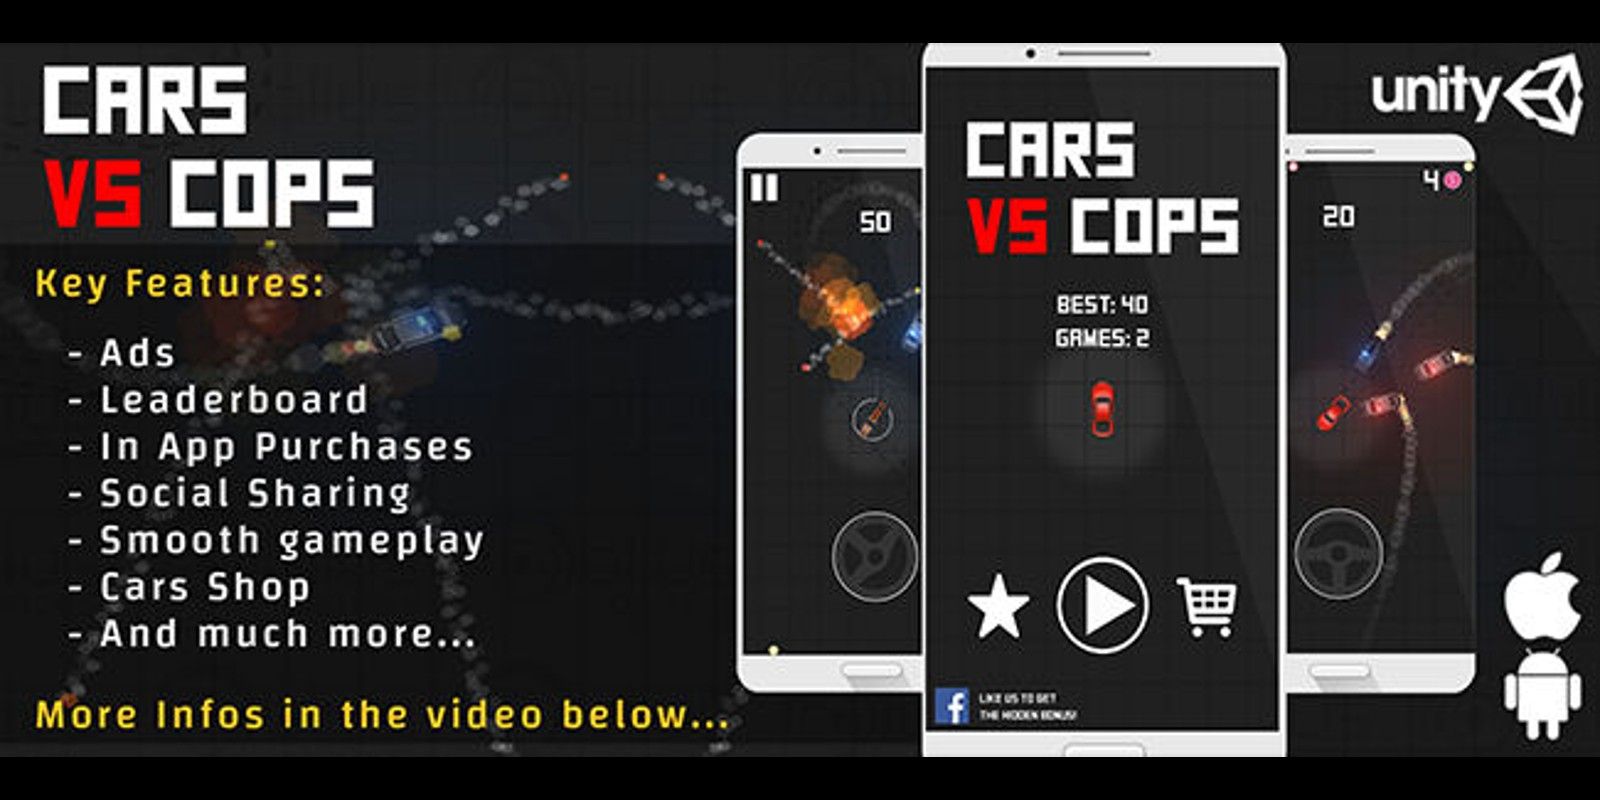 Car Vs Cops - Complete Unity Project